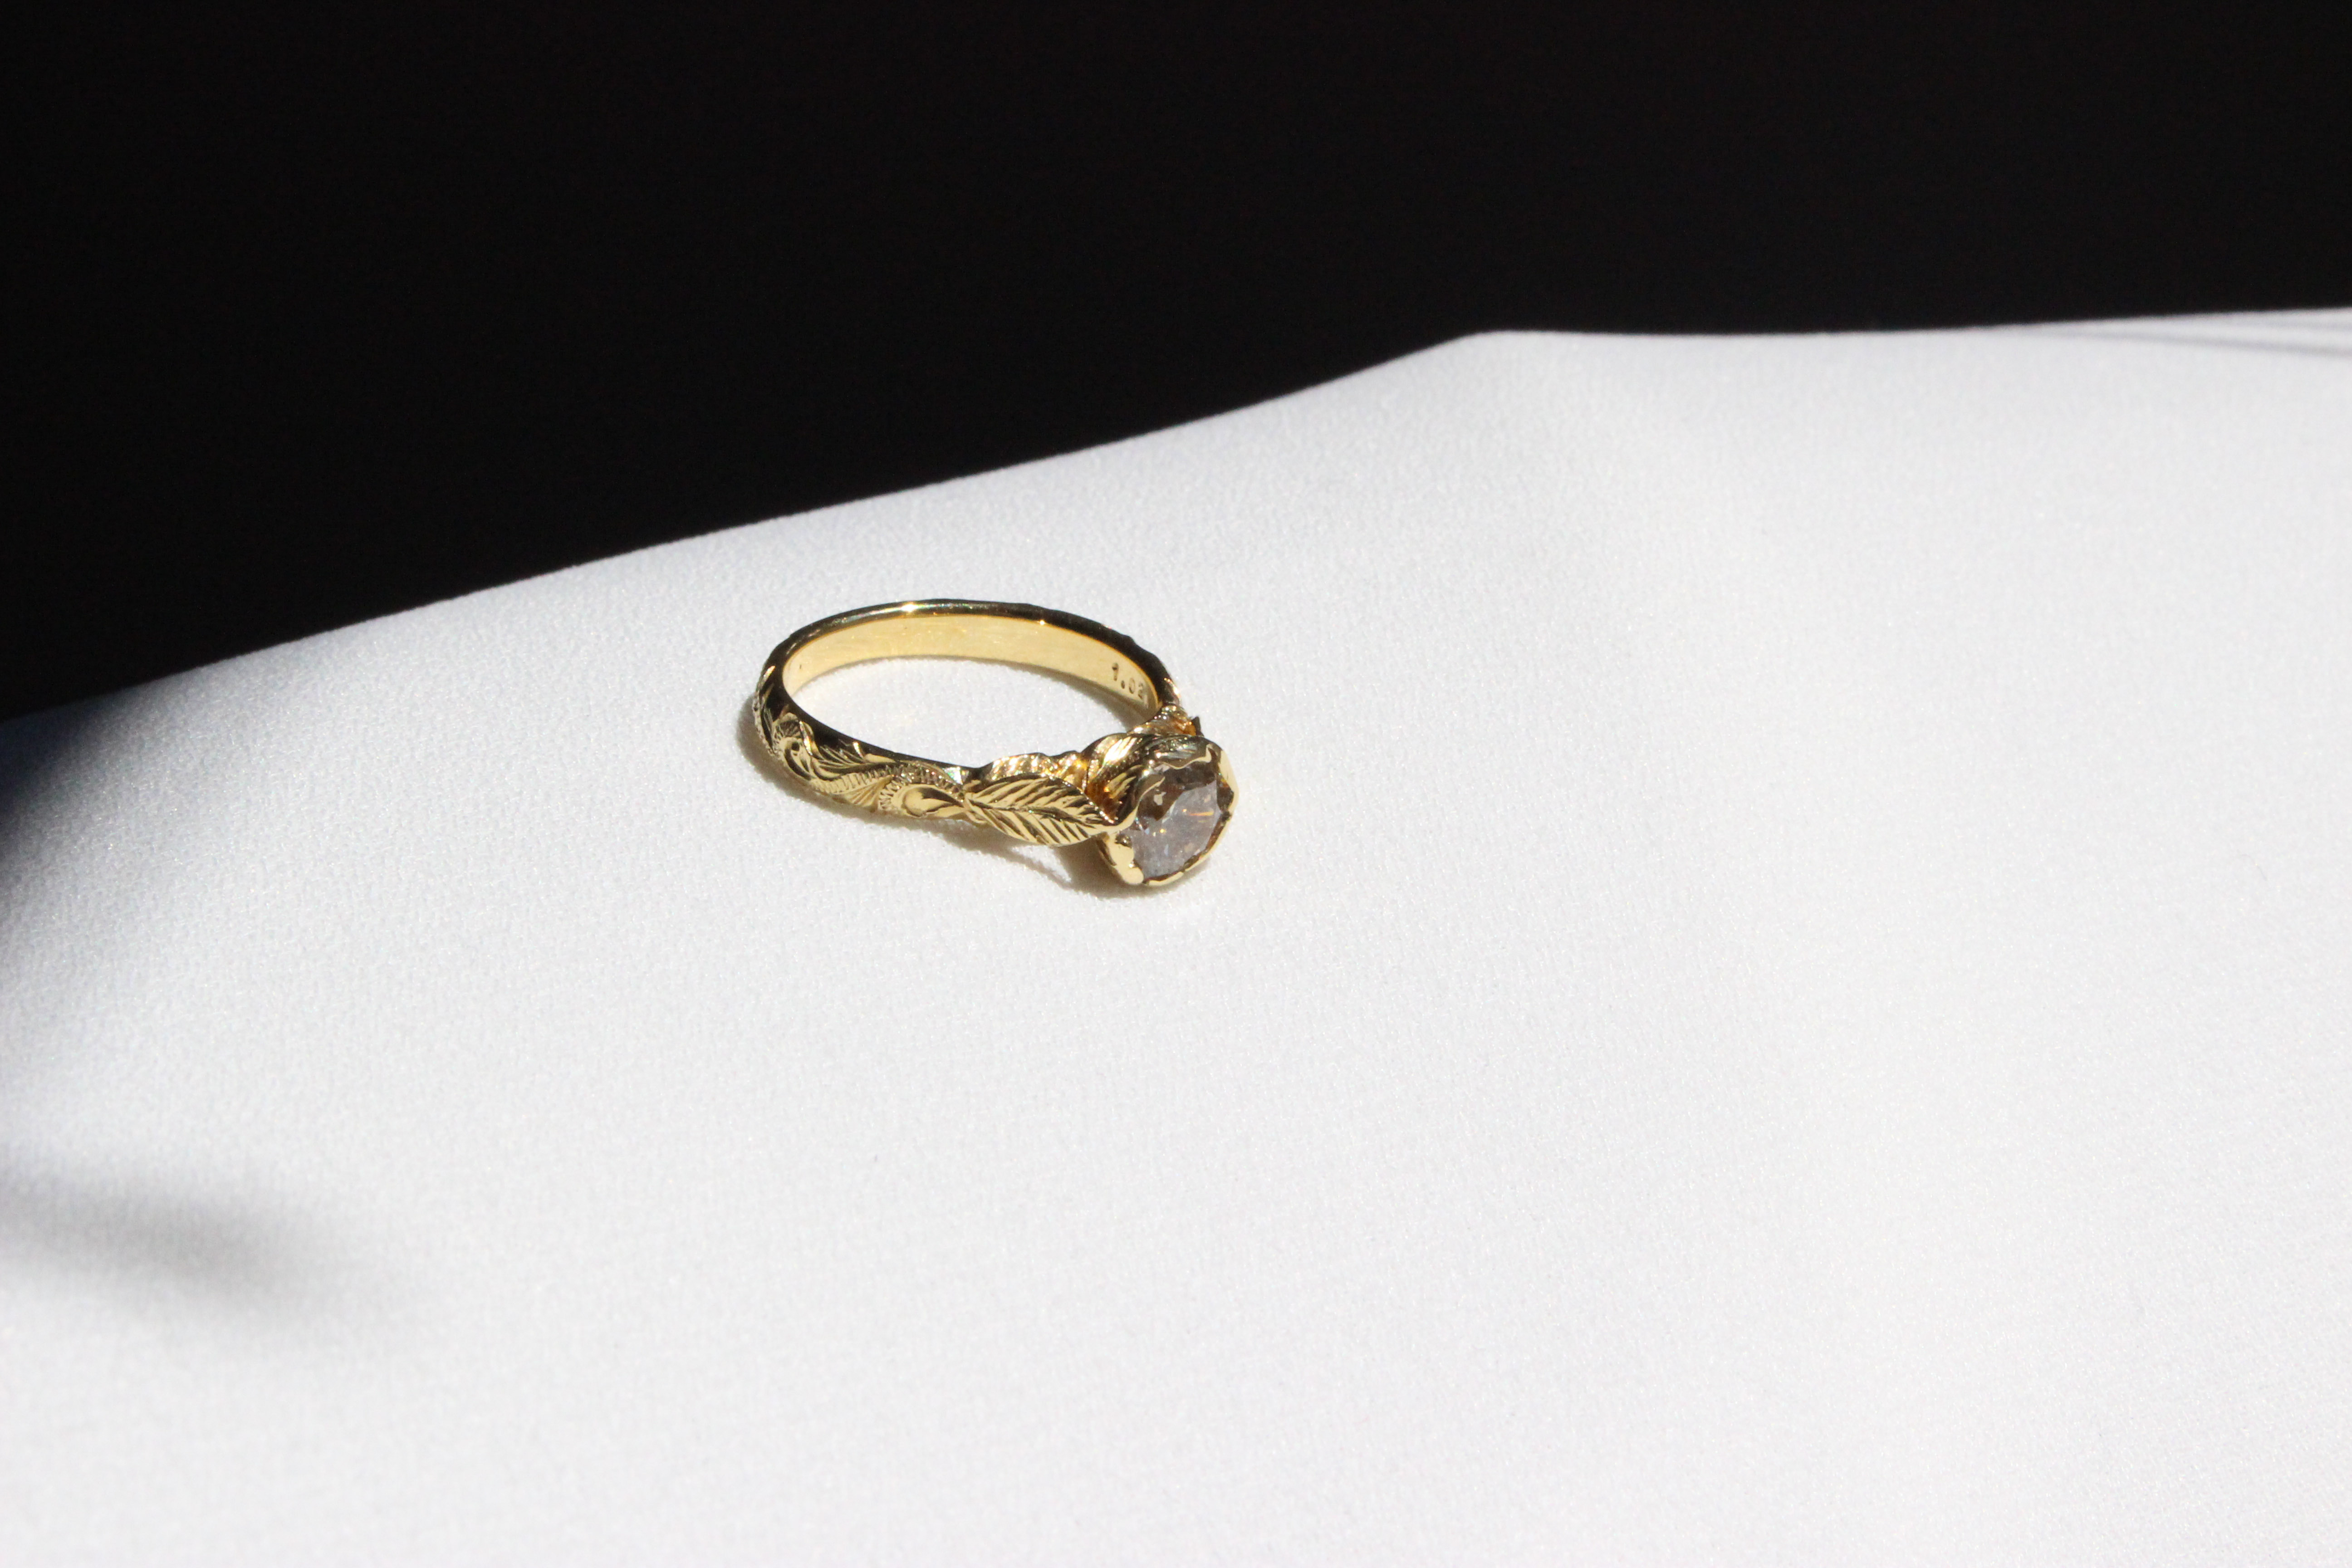 KAMUELA ROSE BROWN DIAMOND RING